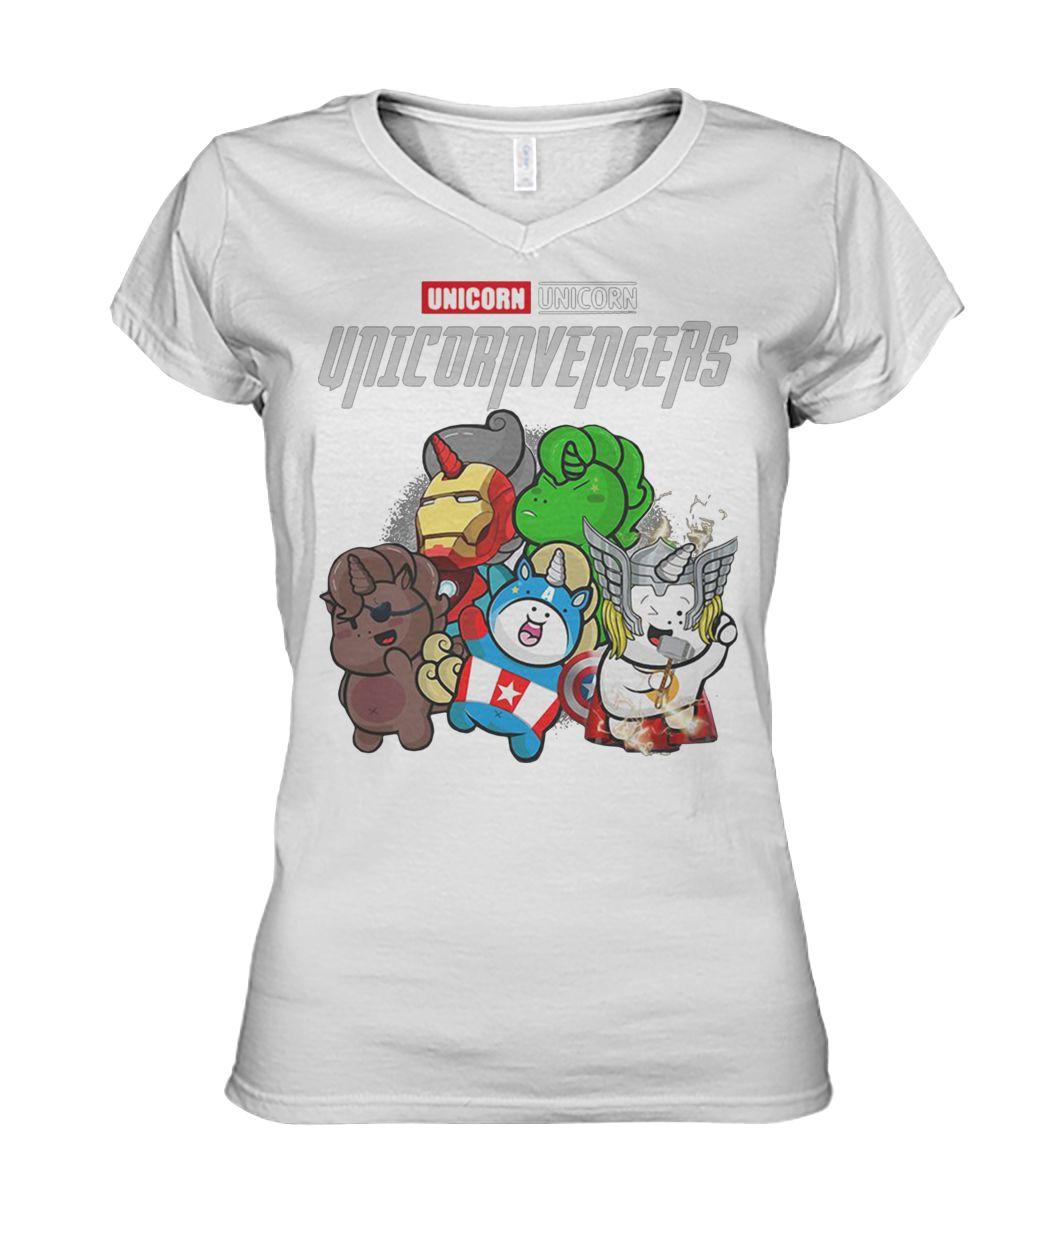 [Hot version] Marvel avengers endgame unicornvengers unicorn shirt